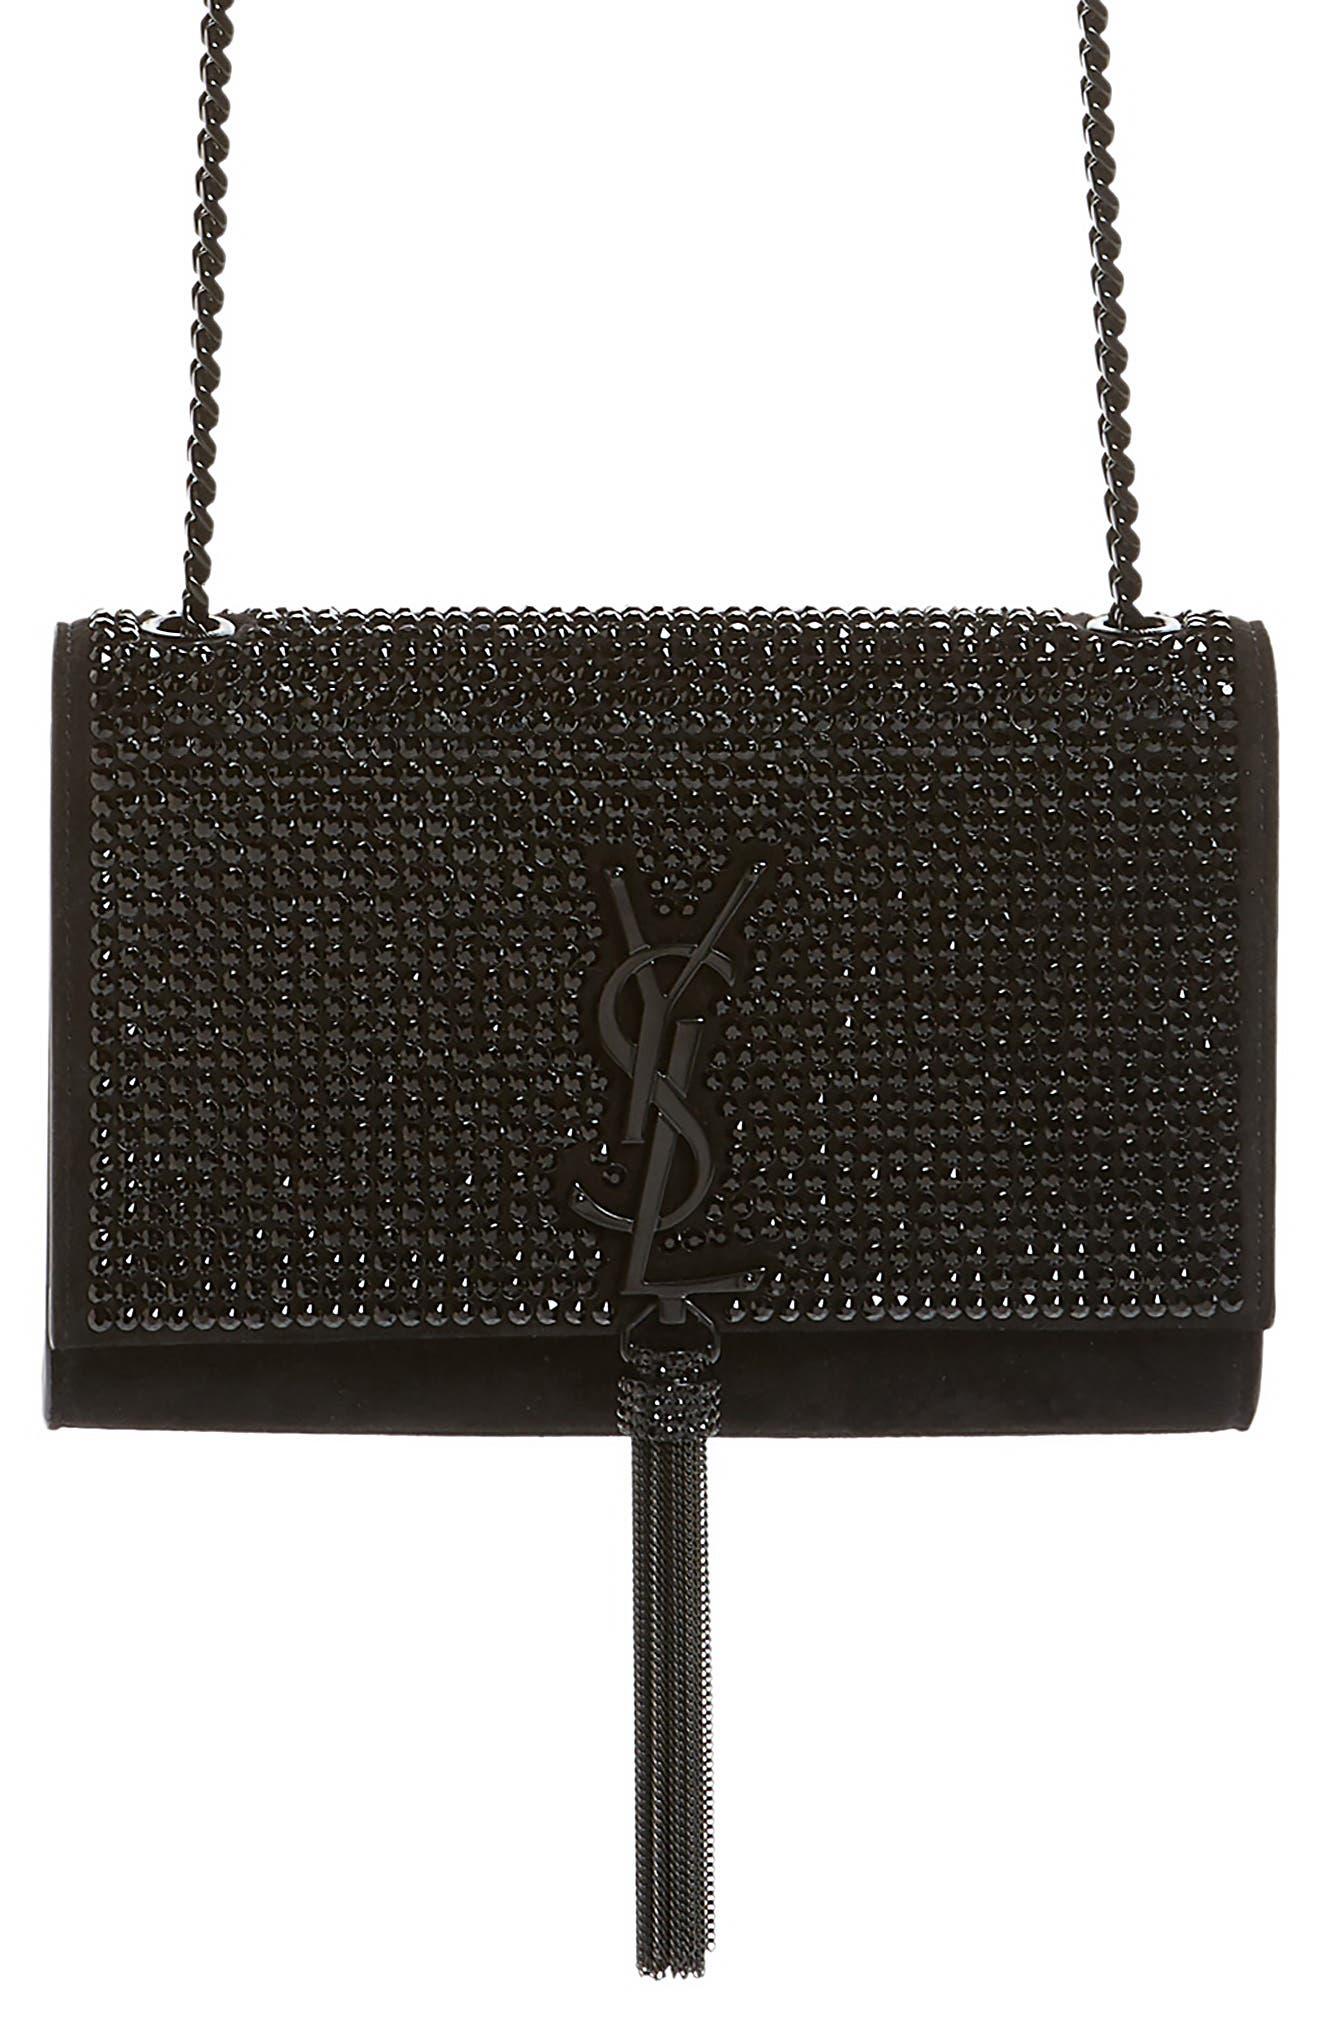 Small Kate Crystal Embellished Crossbody Bag,                             Main thumbnail 1, color,                             NERO/ JET